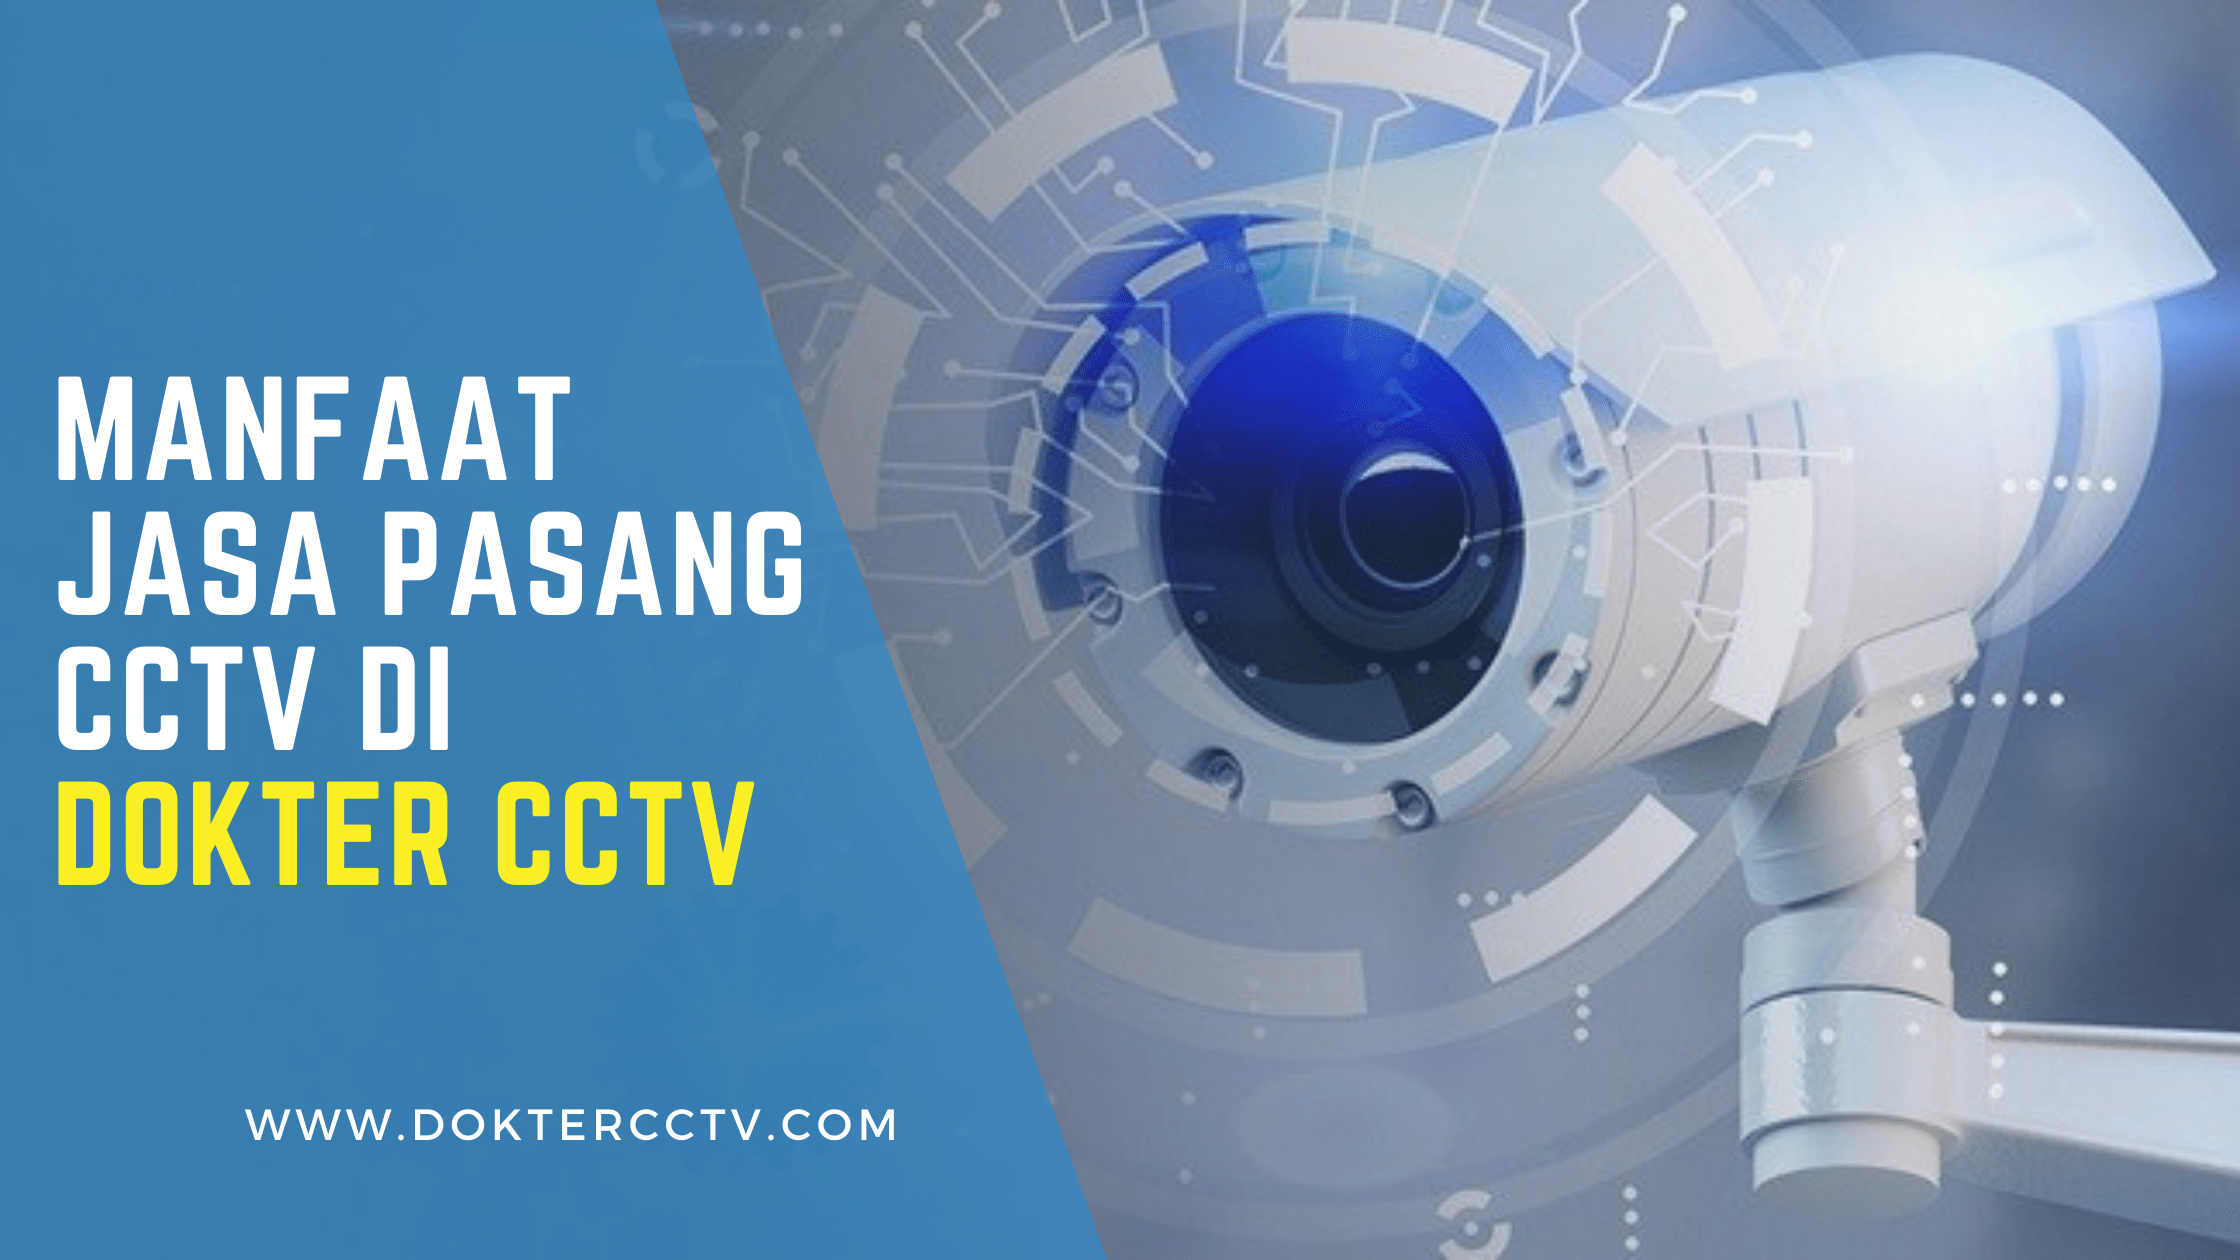 Manfaat Jasa Pasang CCTV di Dokter CCTV